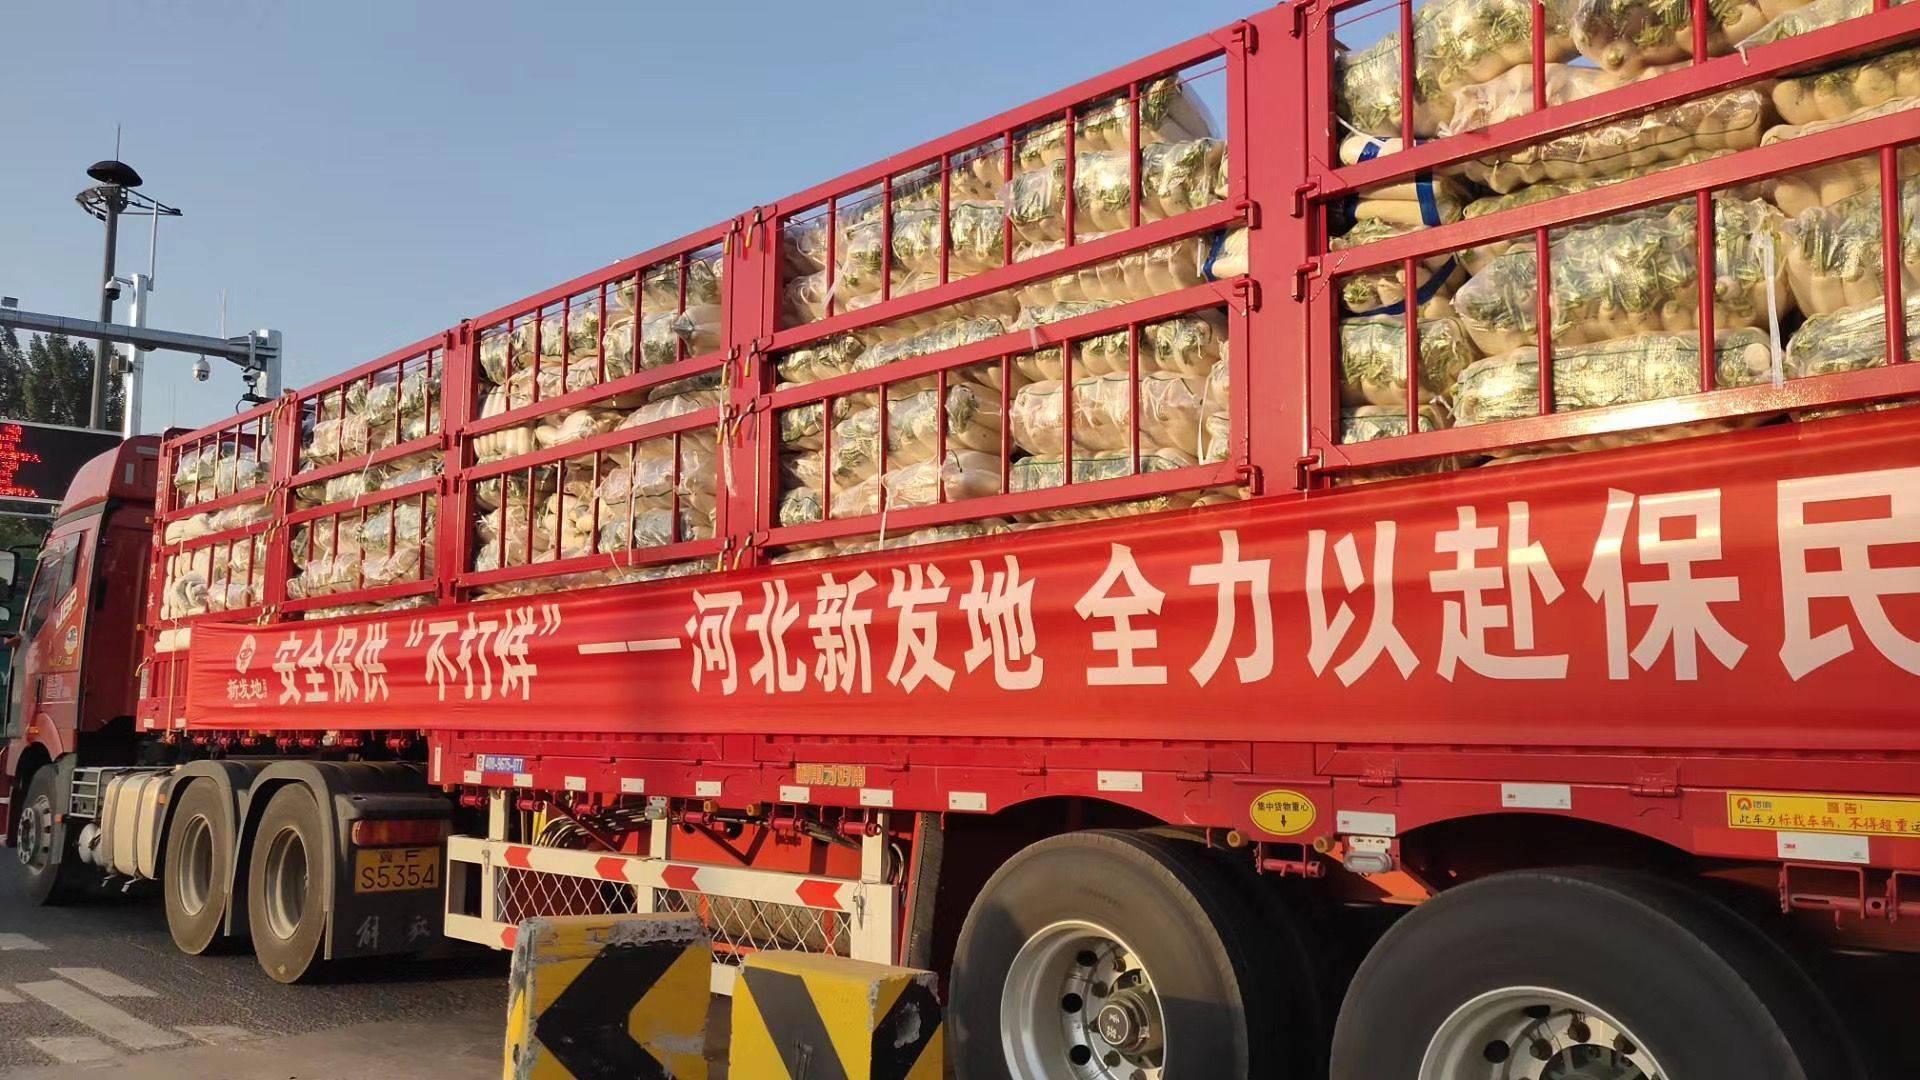 <strong>河北新区首批150吨保底蔬菜今天运</strong>